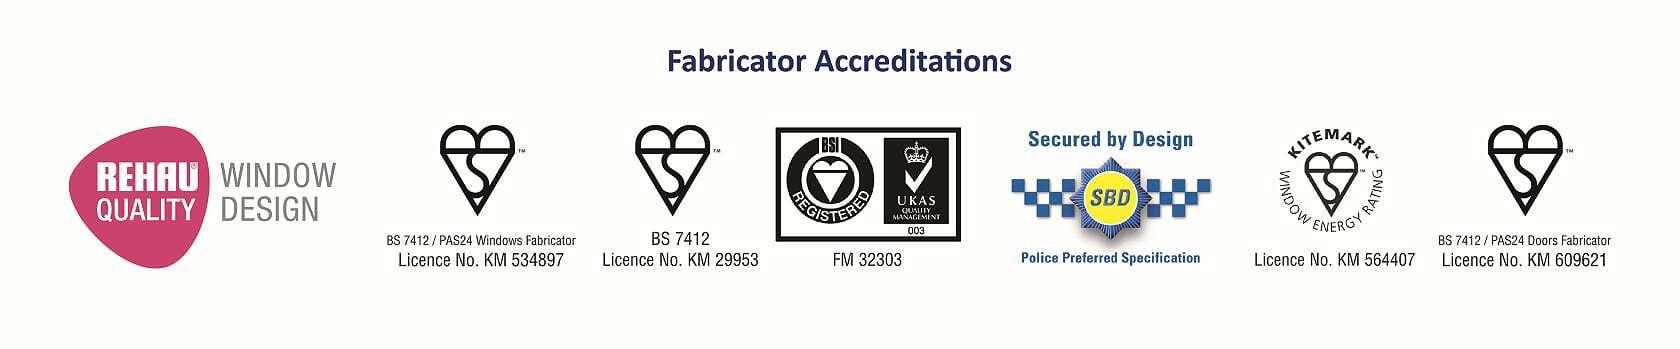 Fabricator accreditations